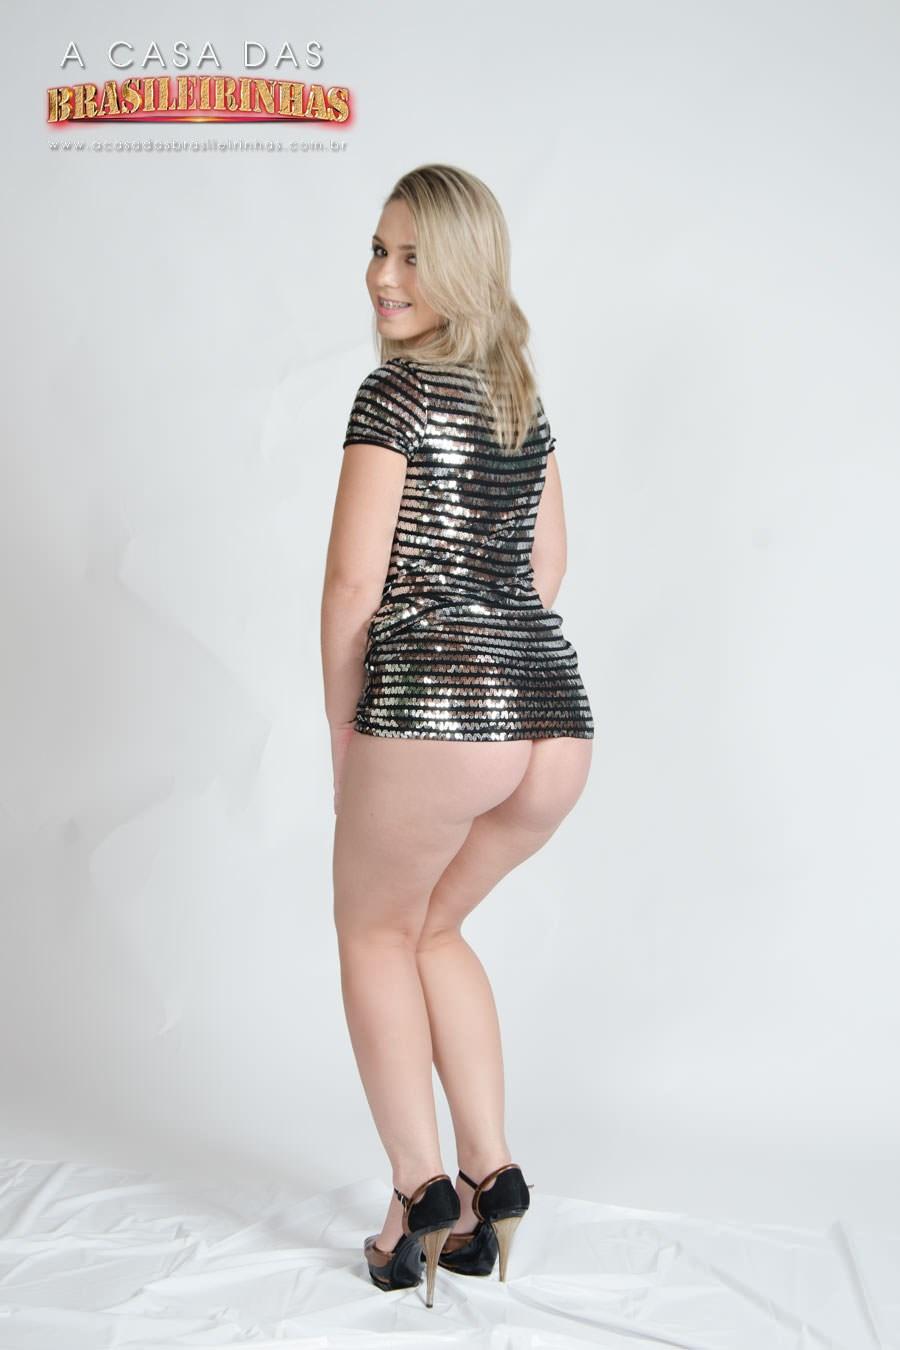 Flavia-Oliveira-mostrando-bunda.jpg